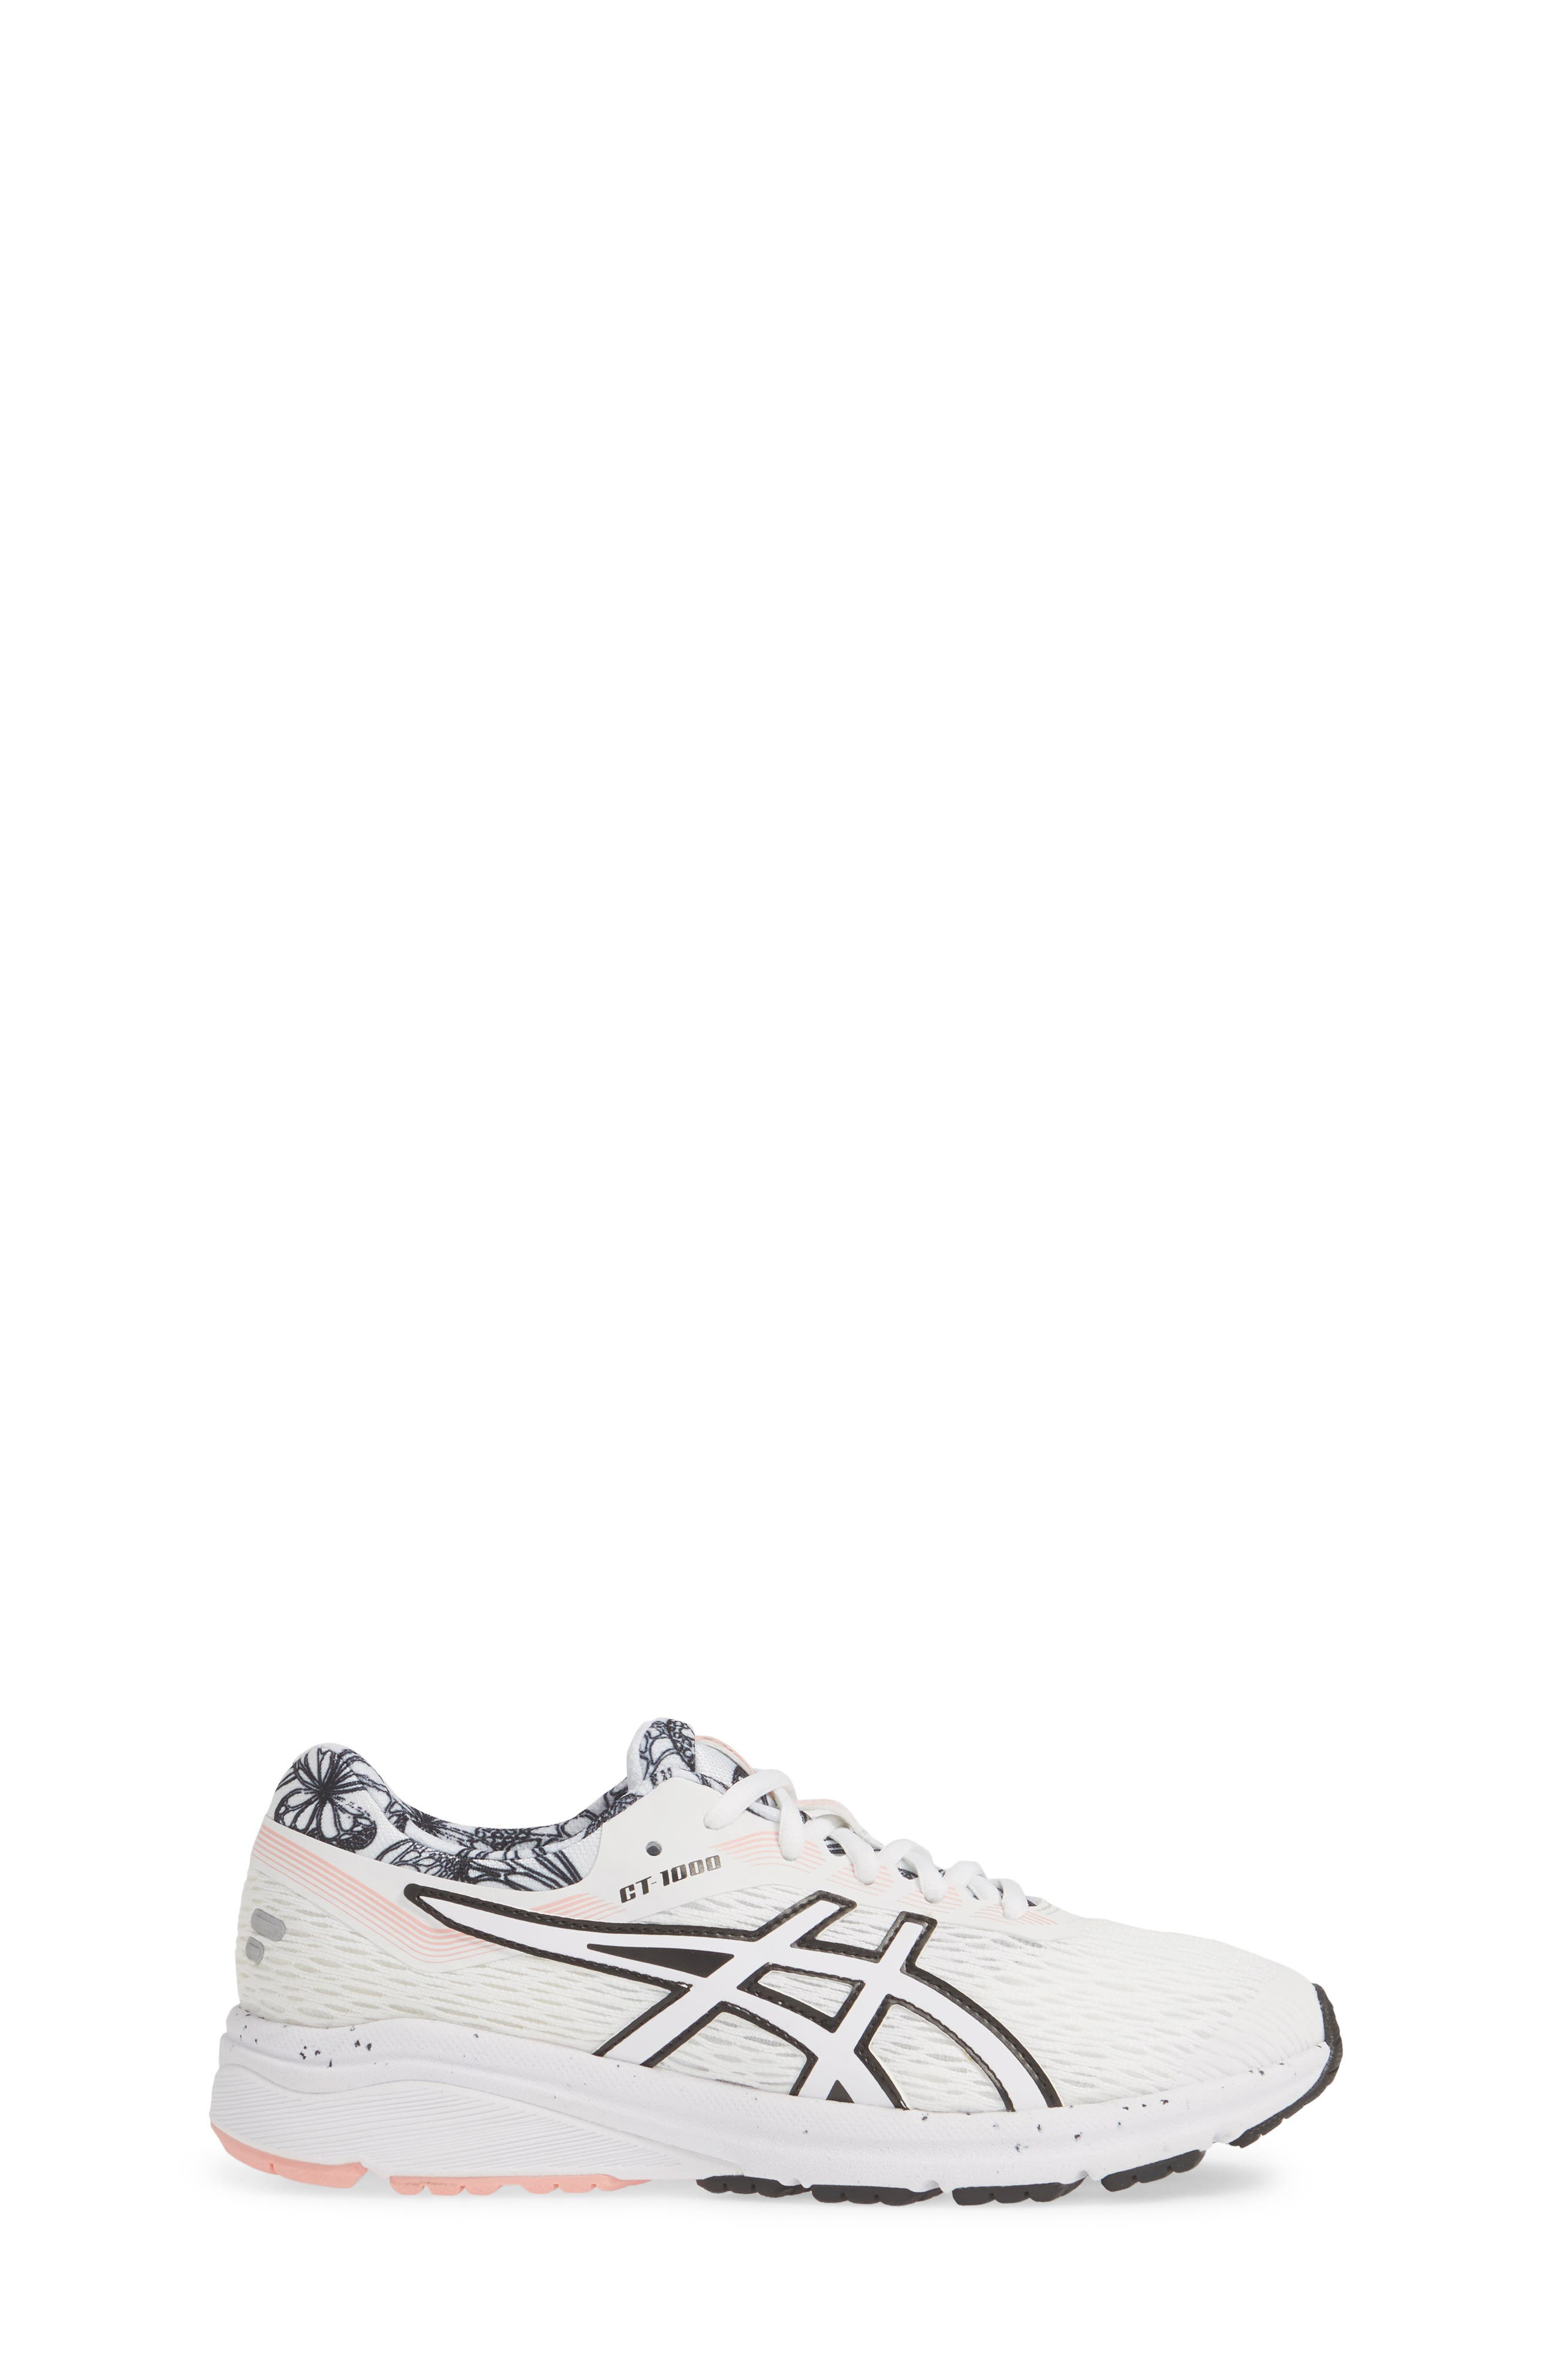 ASICS<SUP>®</SUP>, GT 1000 7 Running Shoe, Alternate thumbnail 3, color, WHITE/ WHITE